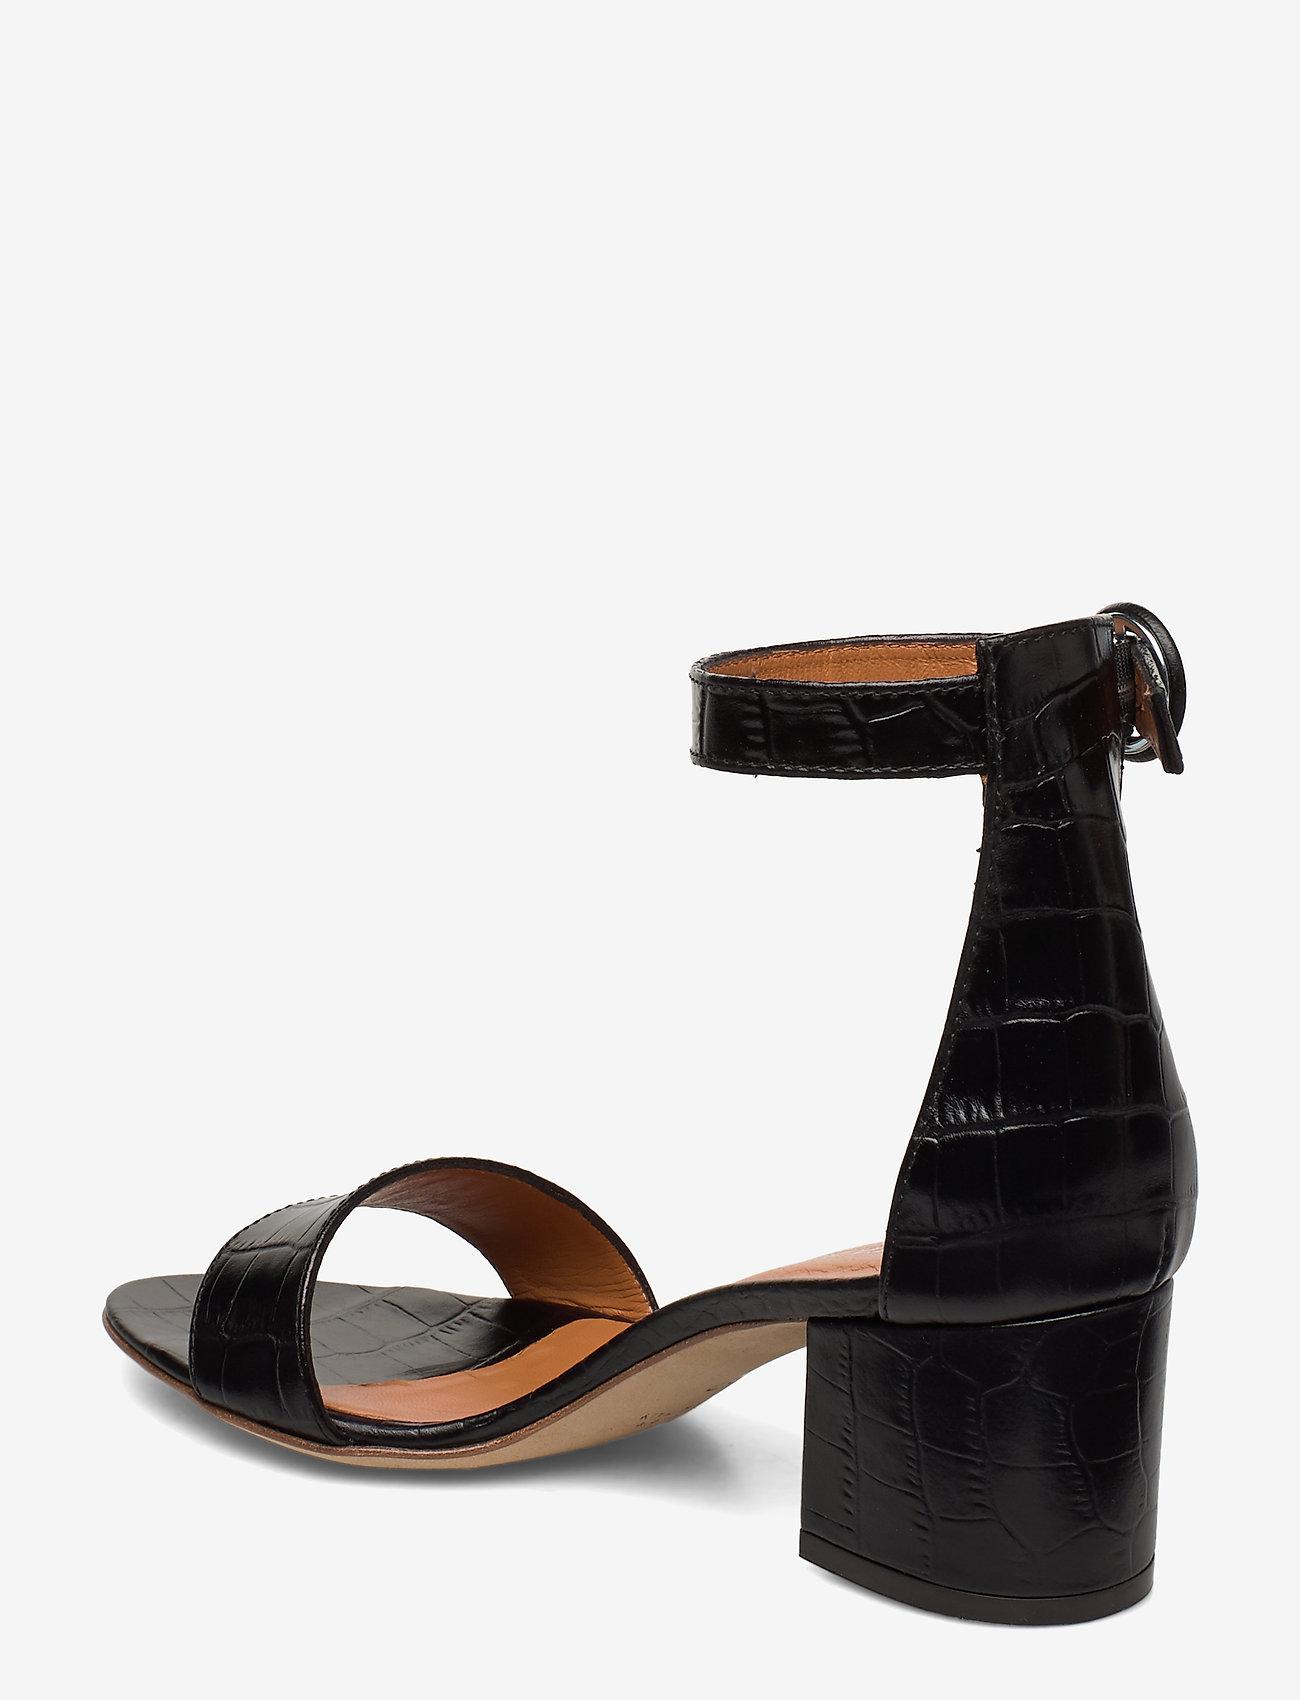 Lia (Black Croco Leather) - NOTABENE